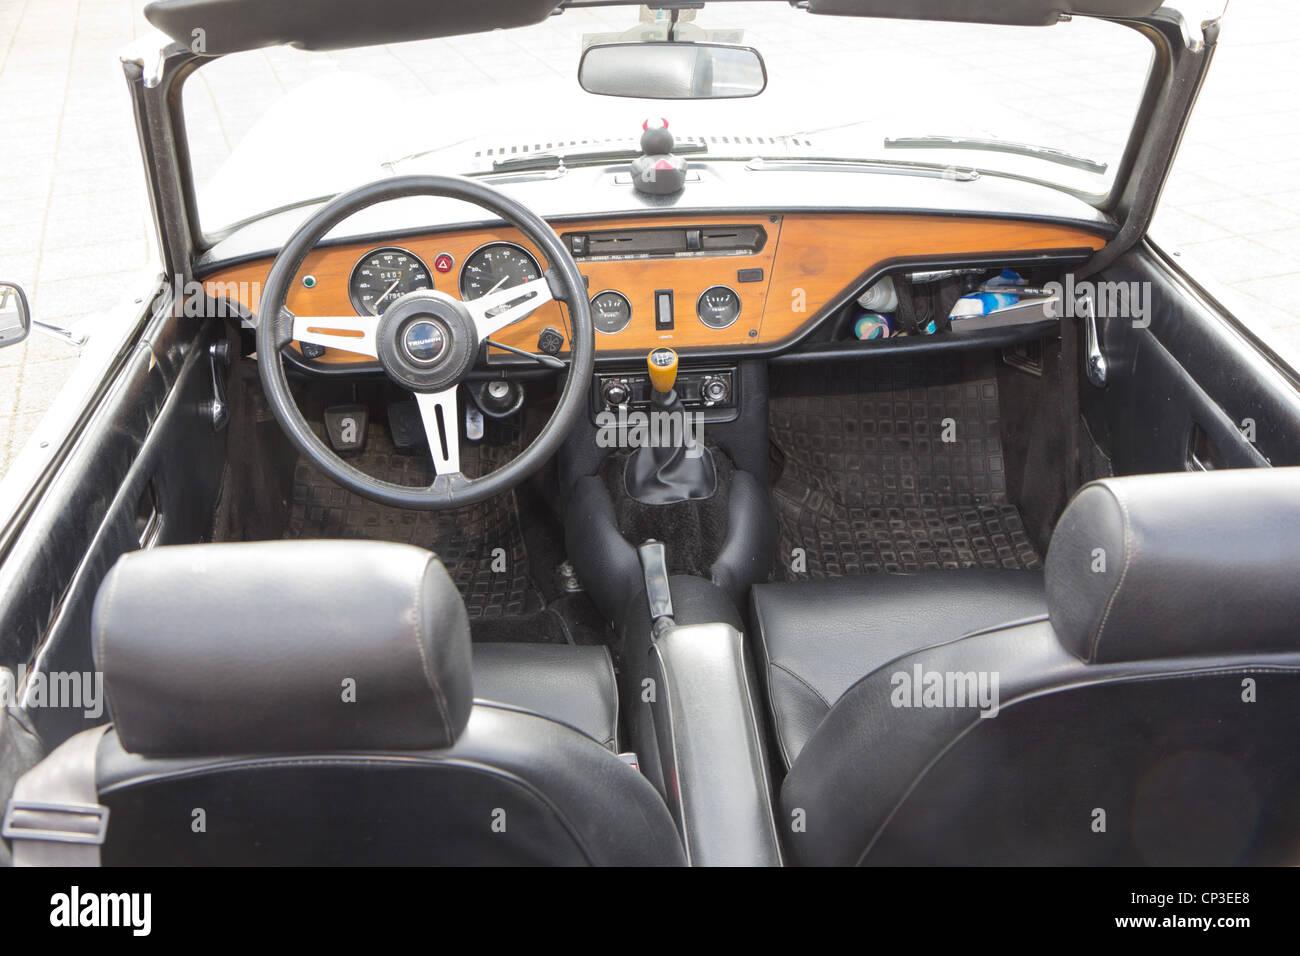 Vintage race car TRIUMPH Spitfire MK I interior from 1964 Stock ...